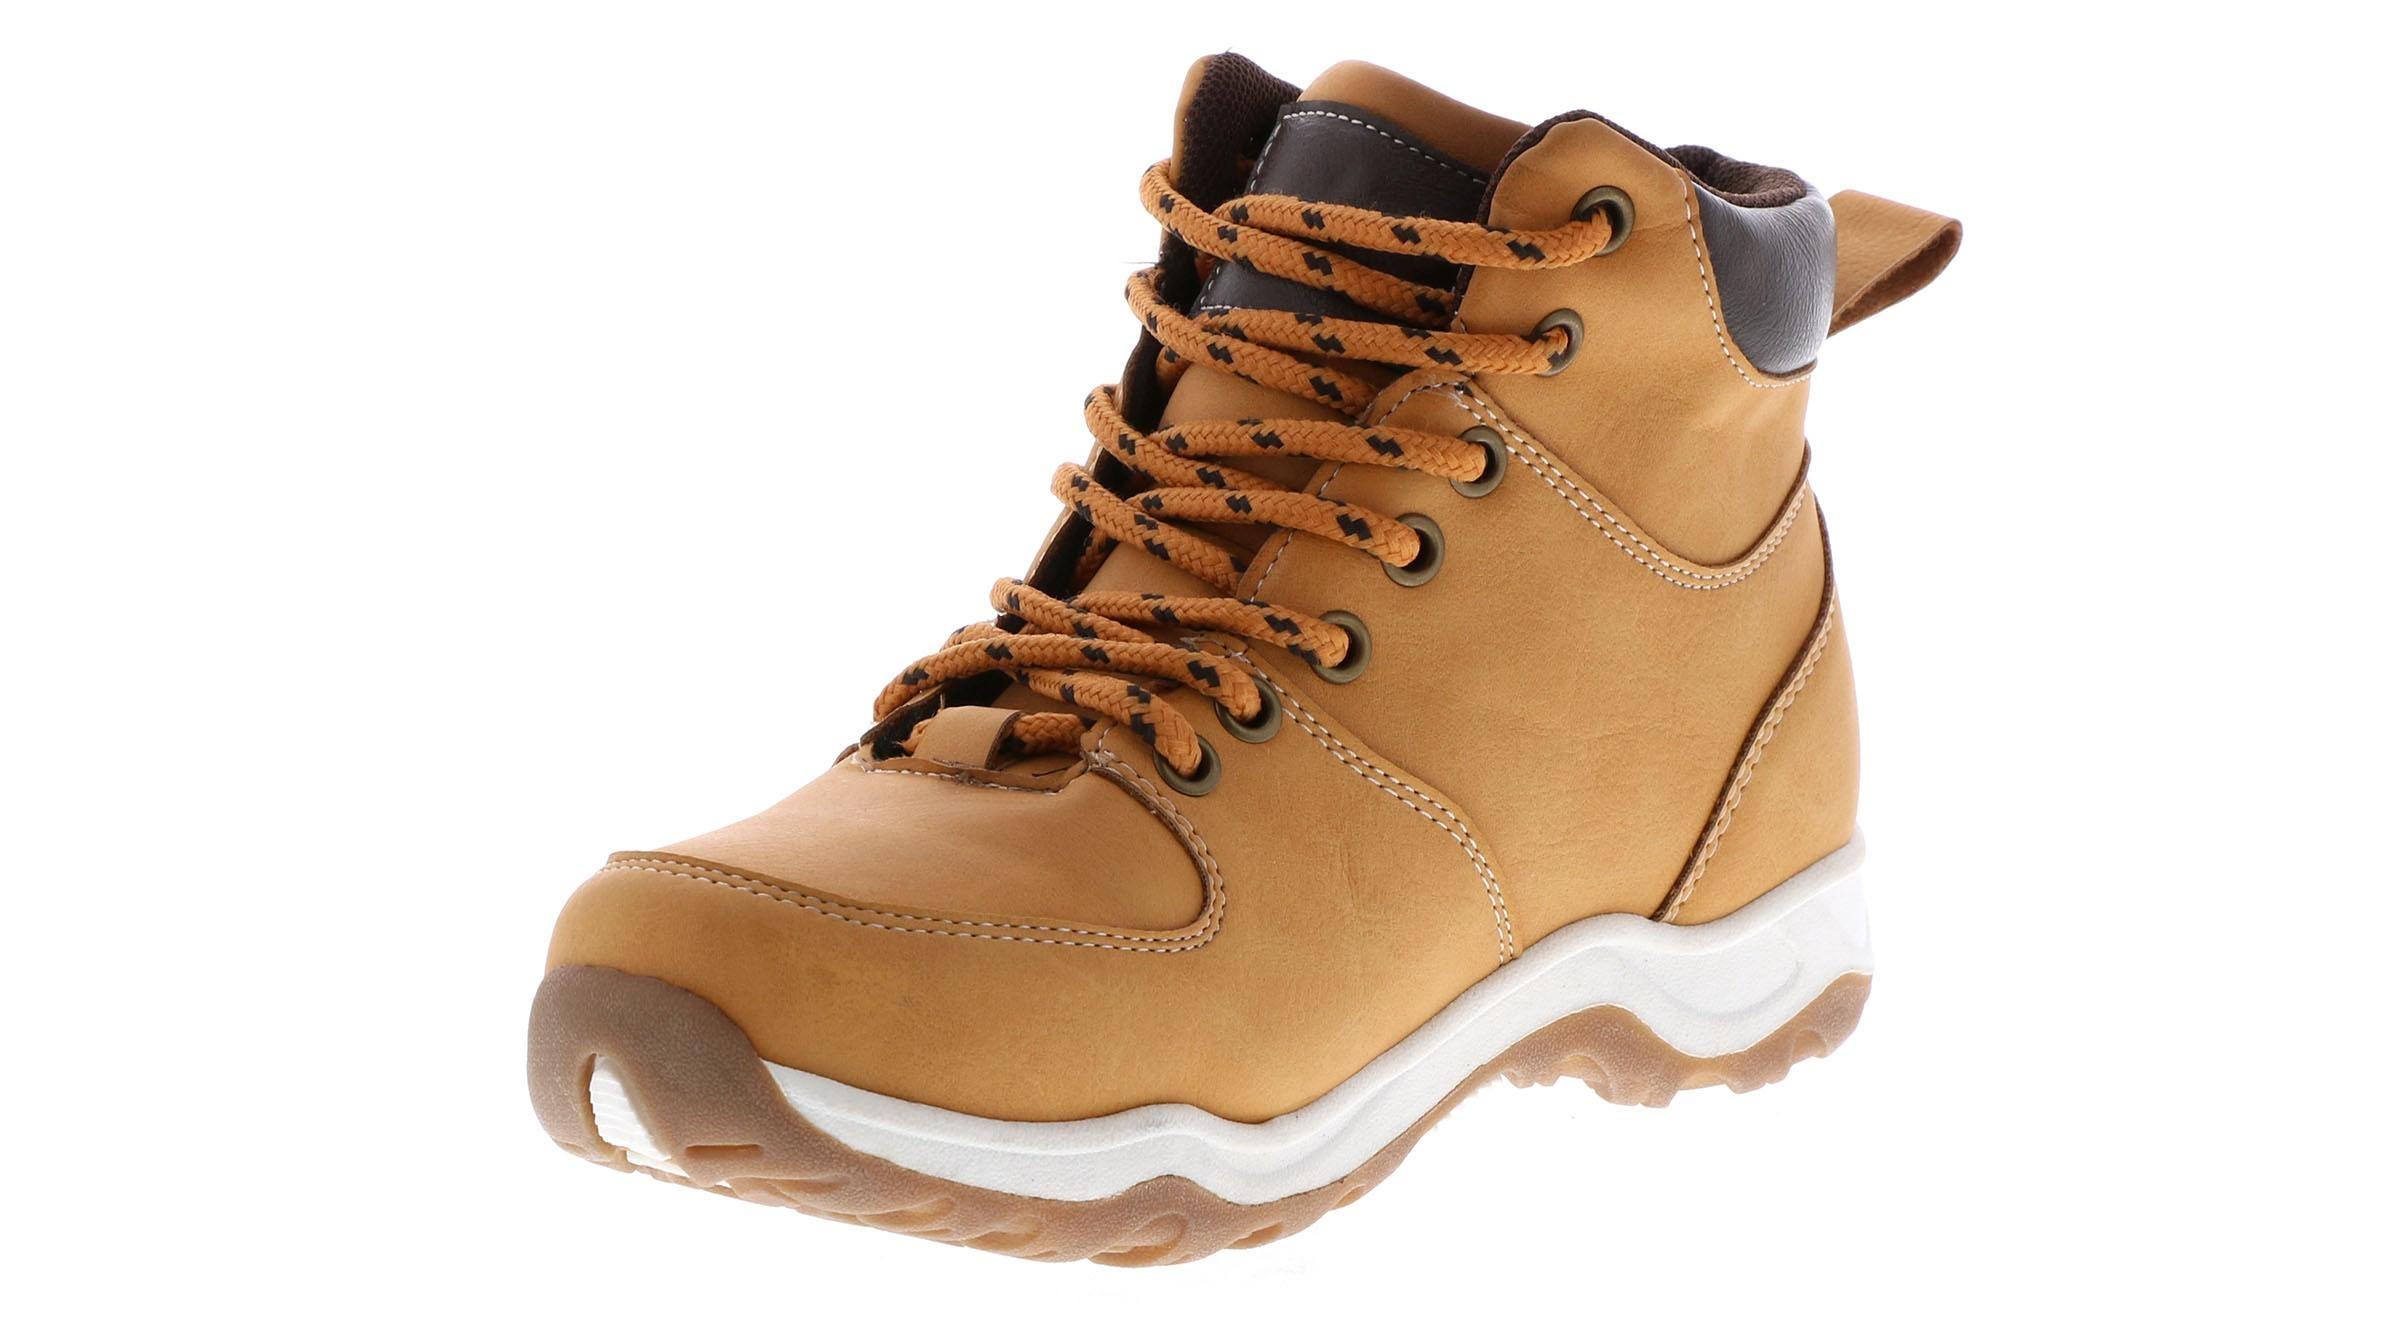 Joseph Allen JA06091 Boys Tan Casual Lace Up Hiking Style Comfort Boots